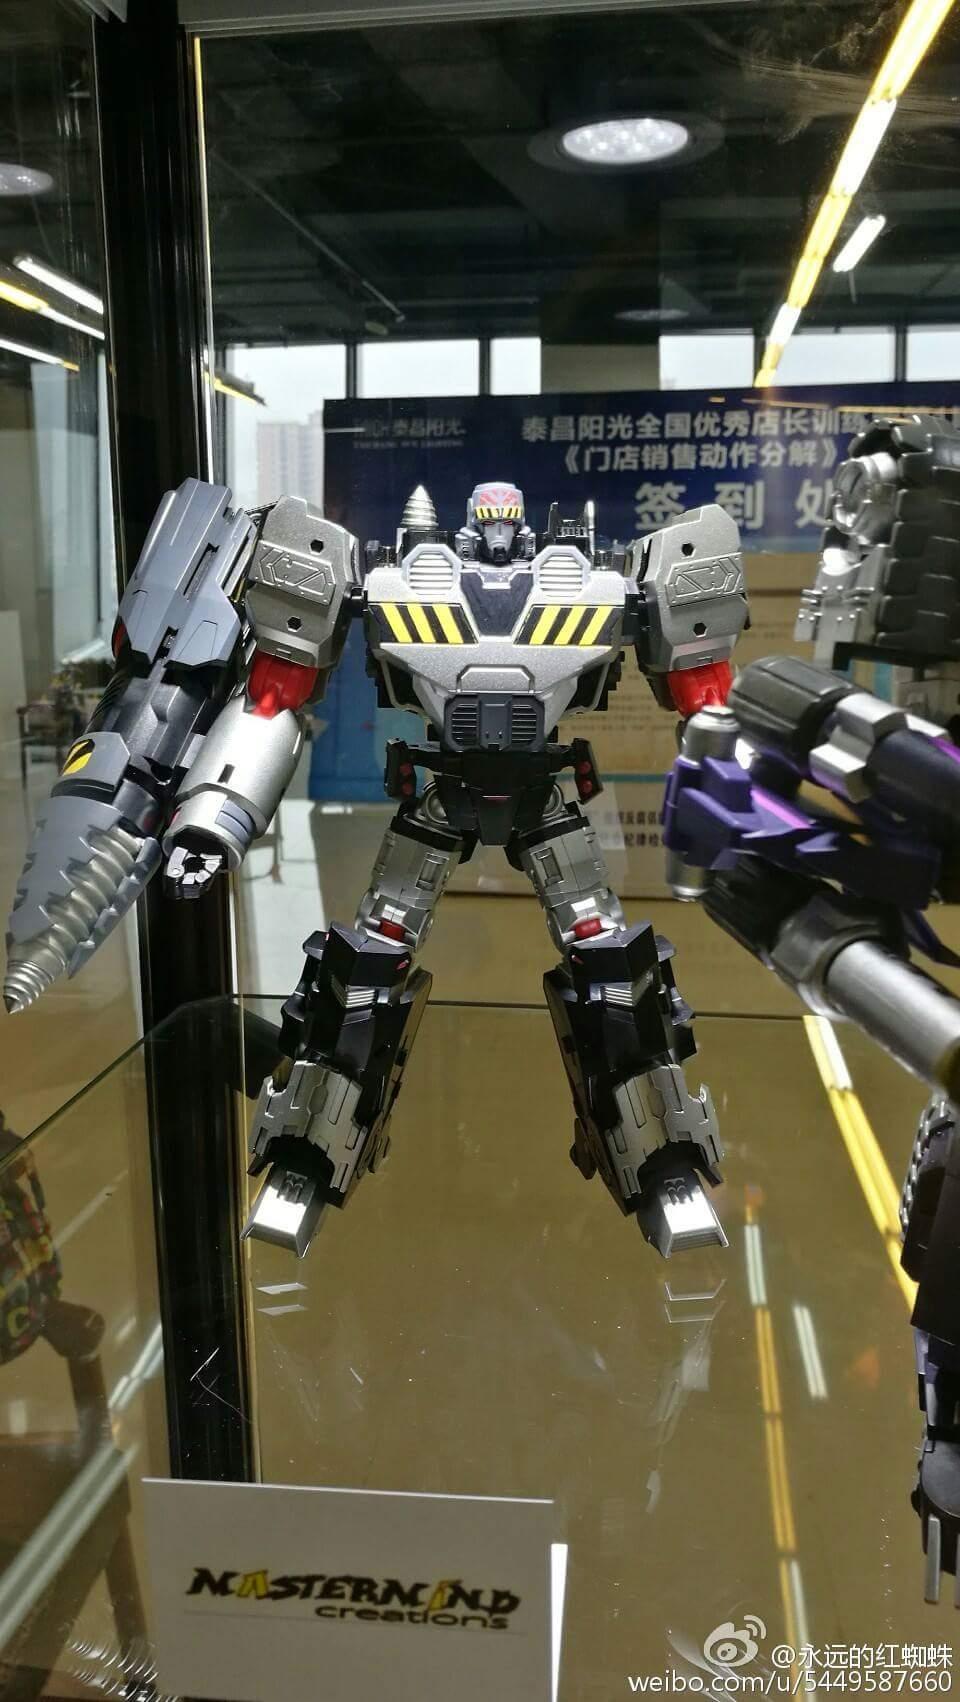 [Mastermind Creations] Produit Tiers - Reformatted R-28 Tyrantron - aka Megatron des BD IDW IDRIg9Hb